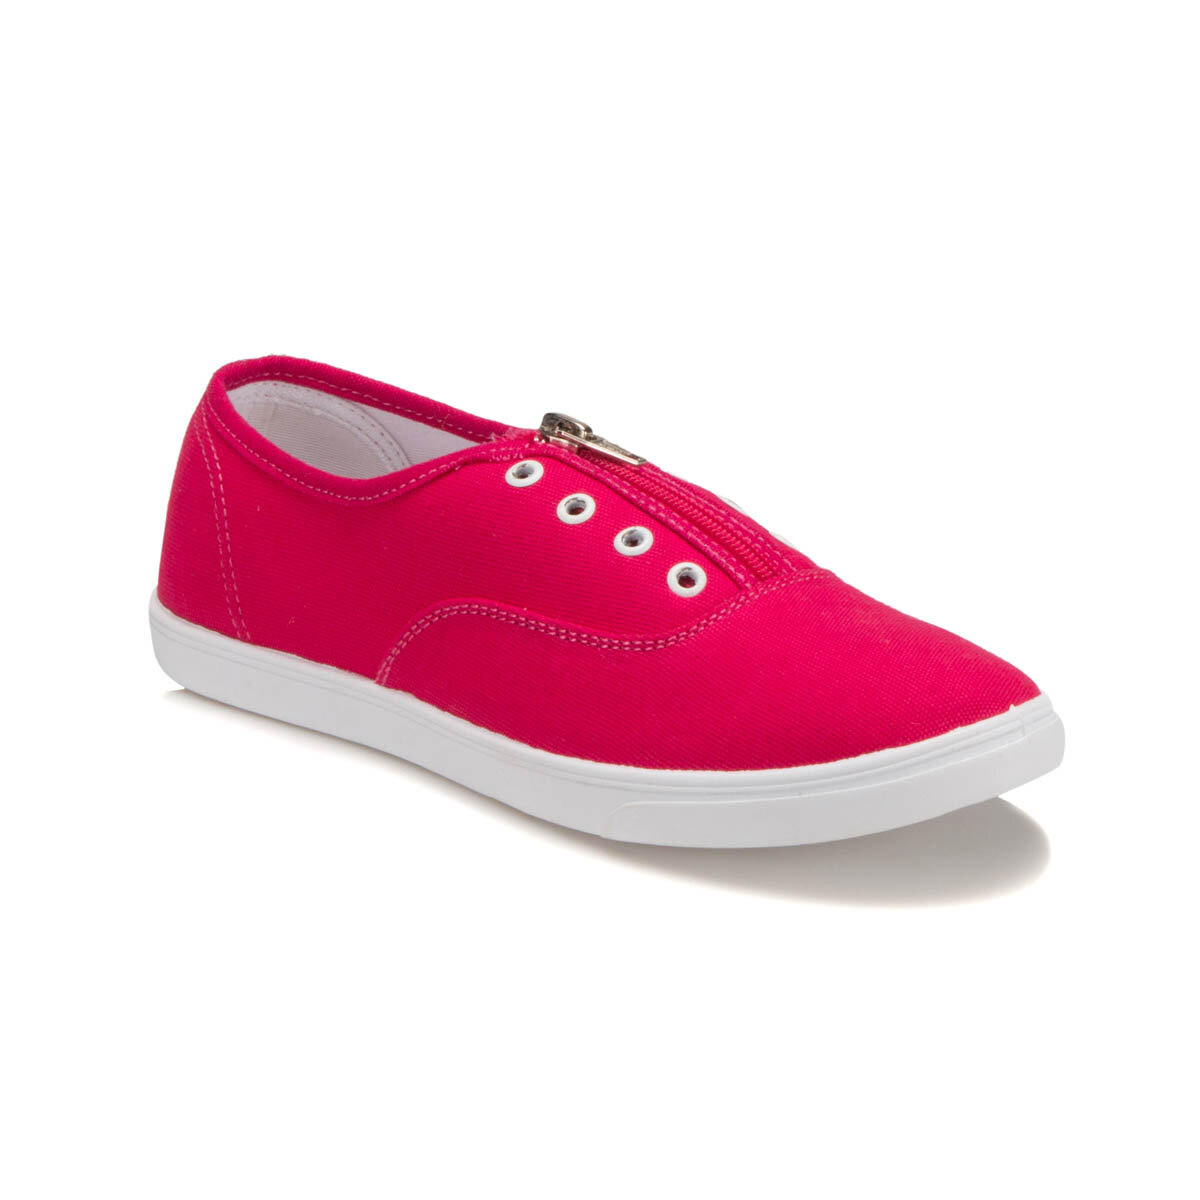 FLO U2301 Red Women Slip On Shoes Carmens